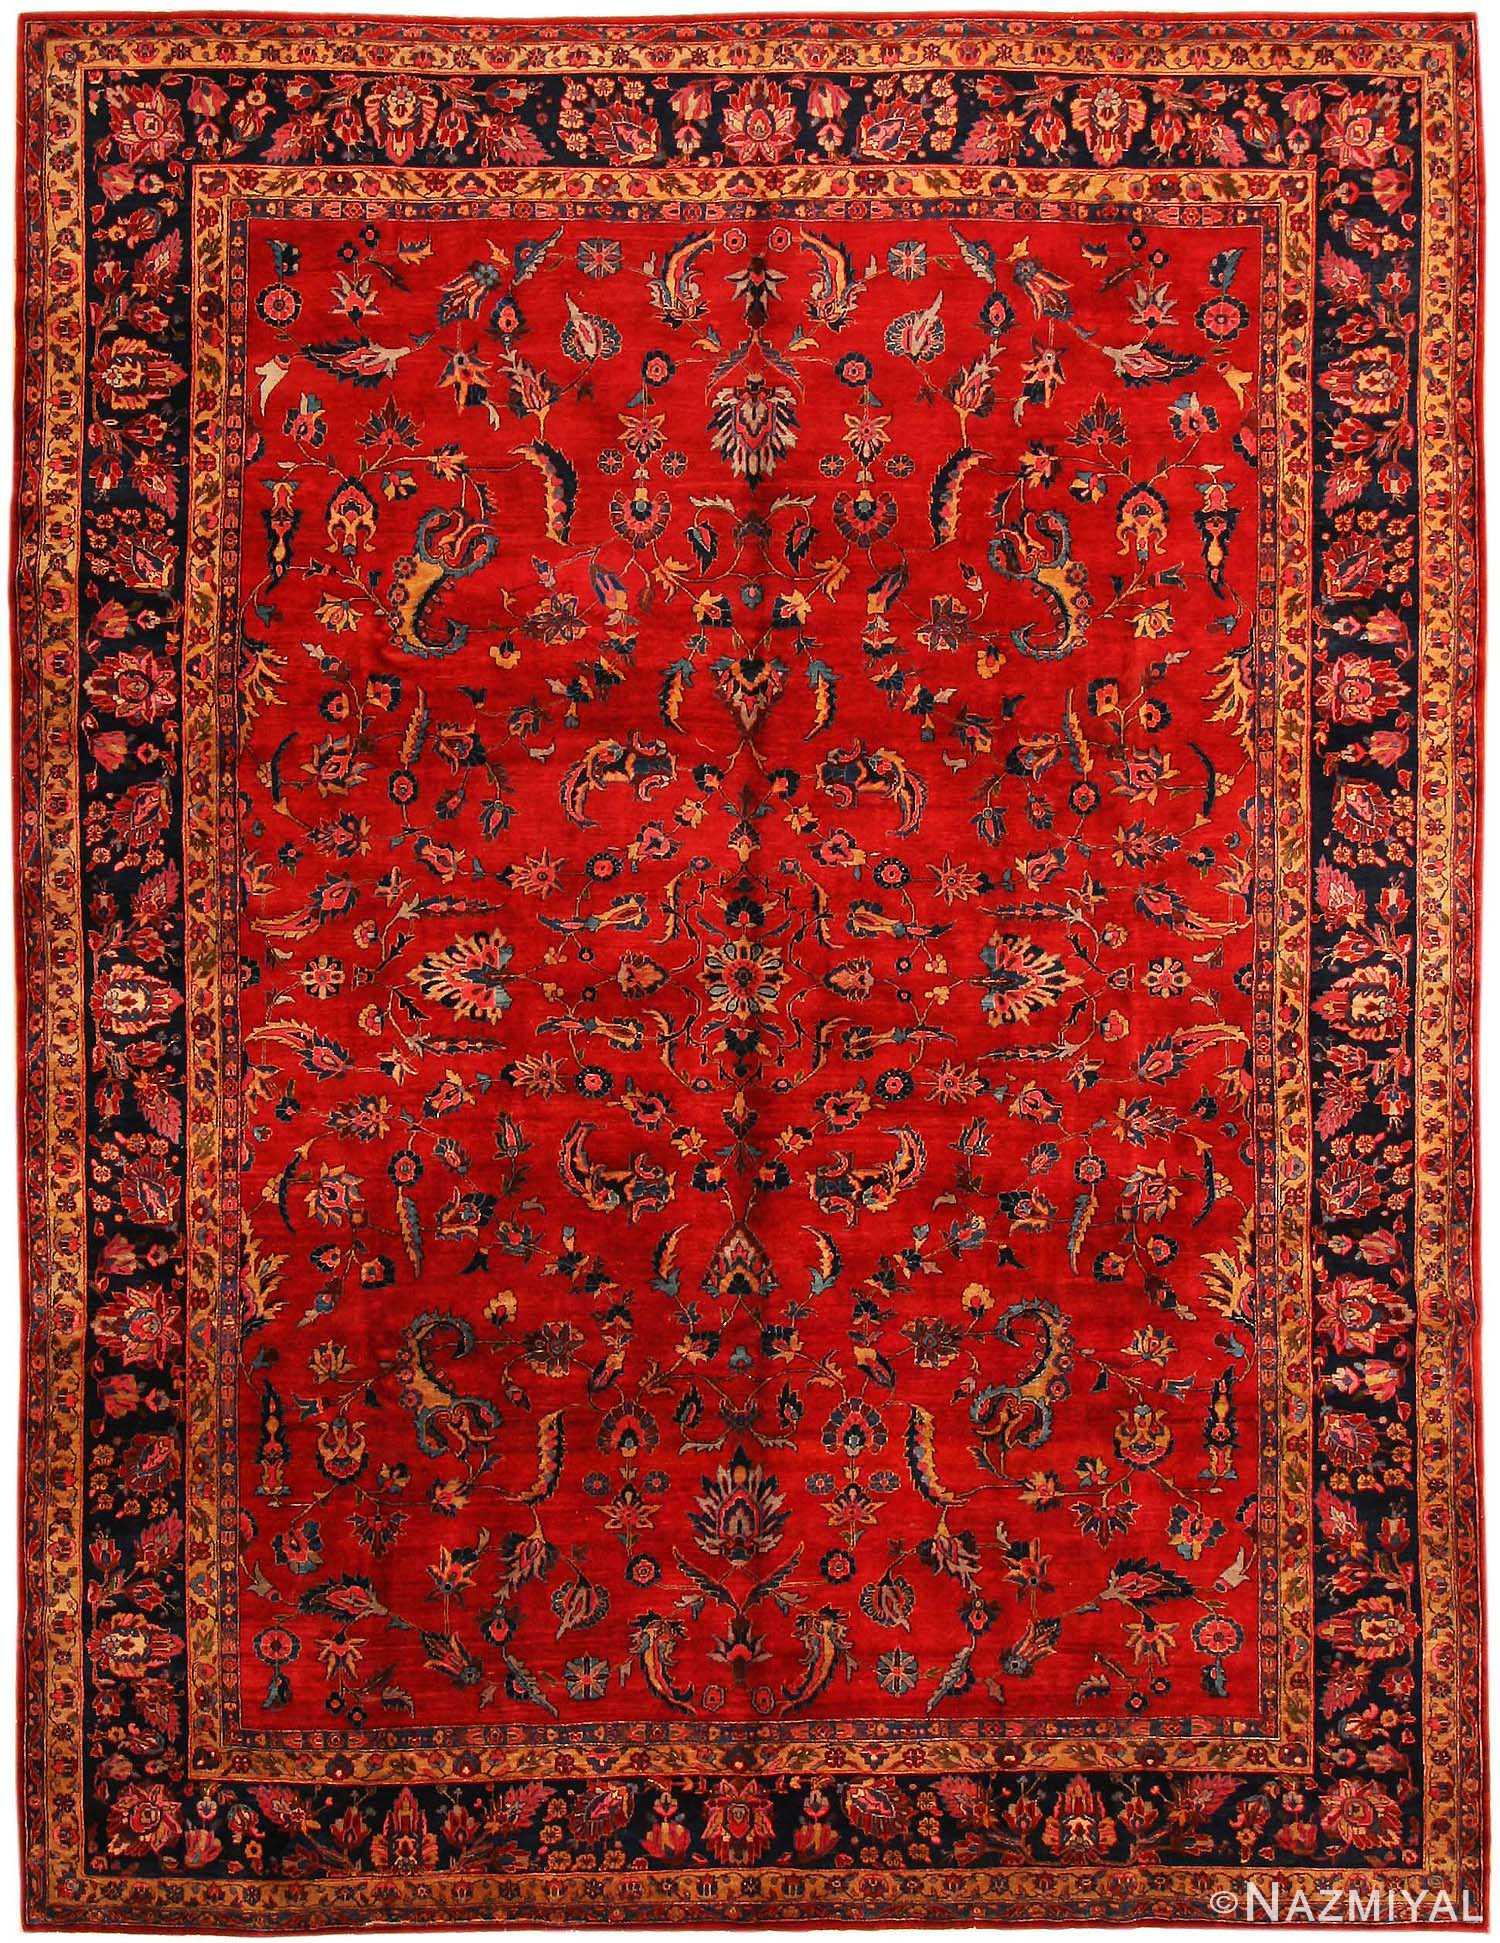 - Antique Sarouk Persian Rug 43524 By Nazmiyal